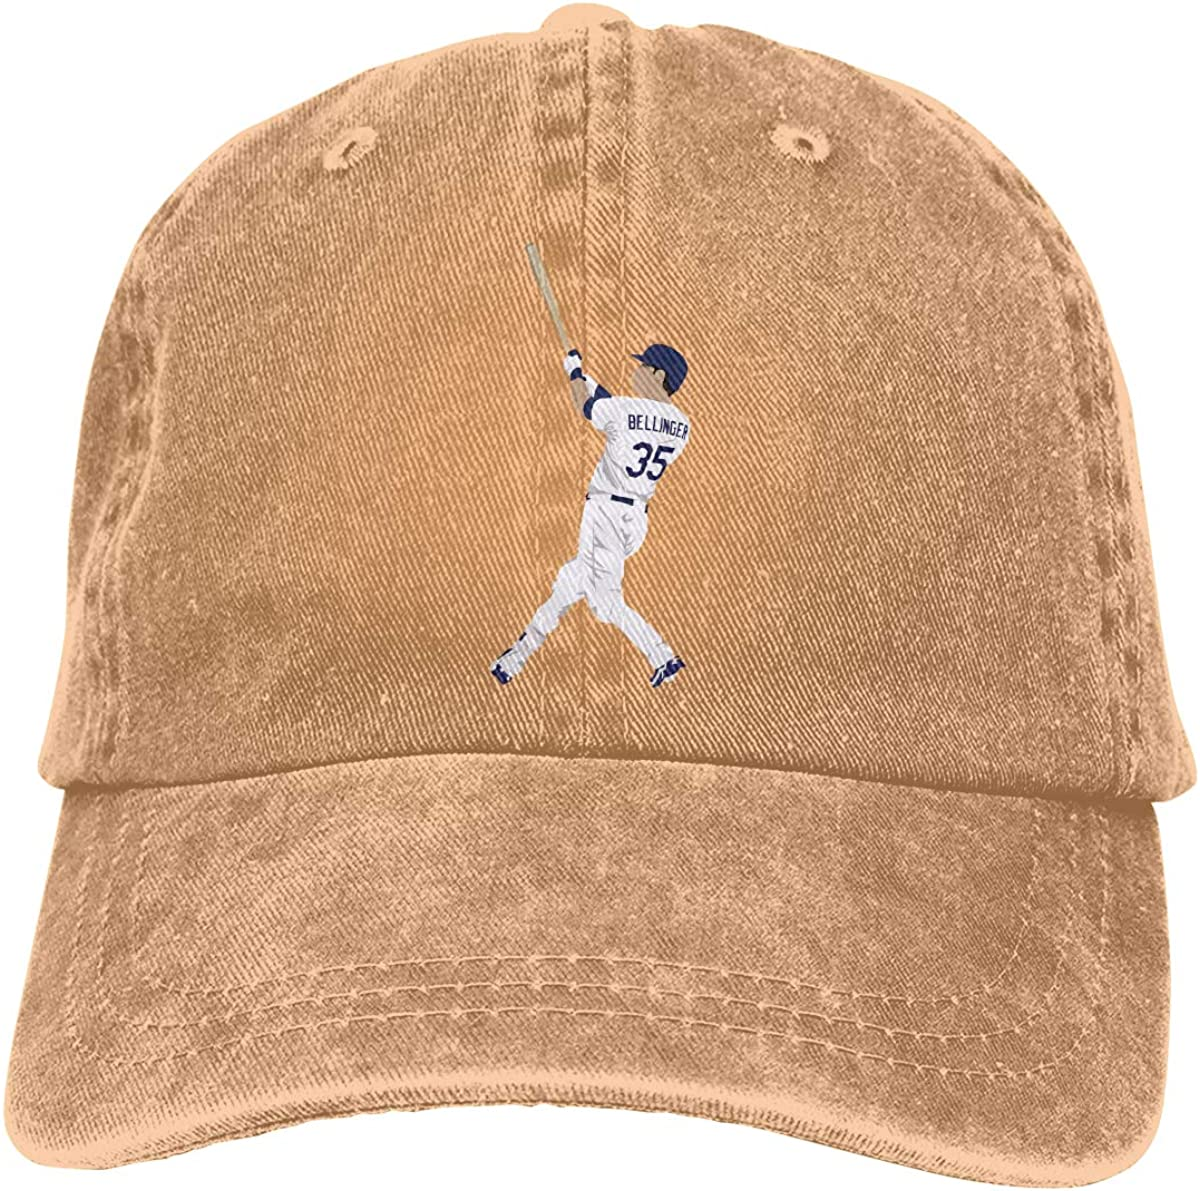 DeniCar Unisex Adjustable Baseball Caps Cody-Bellinger-Logo-Vector Cowboy Skull Cap